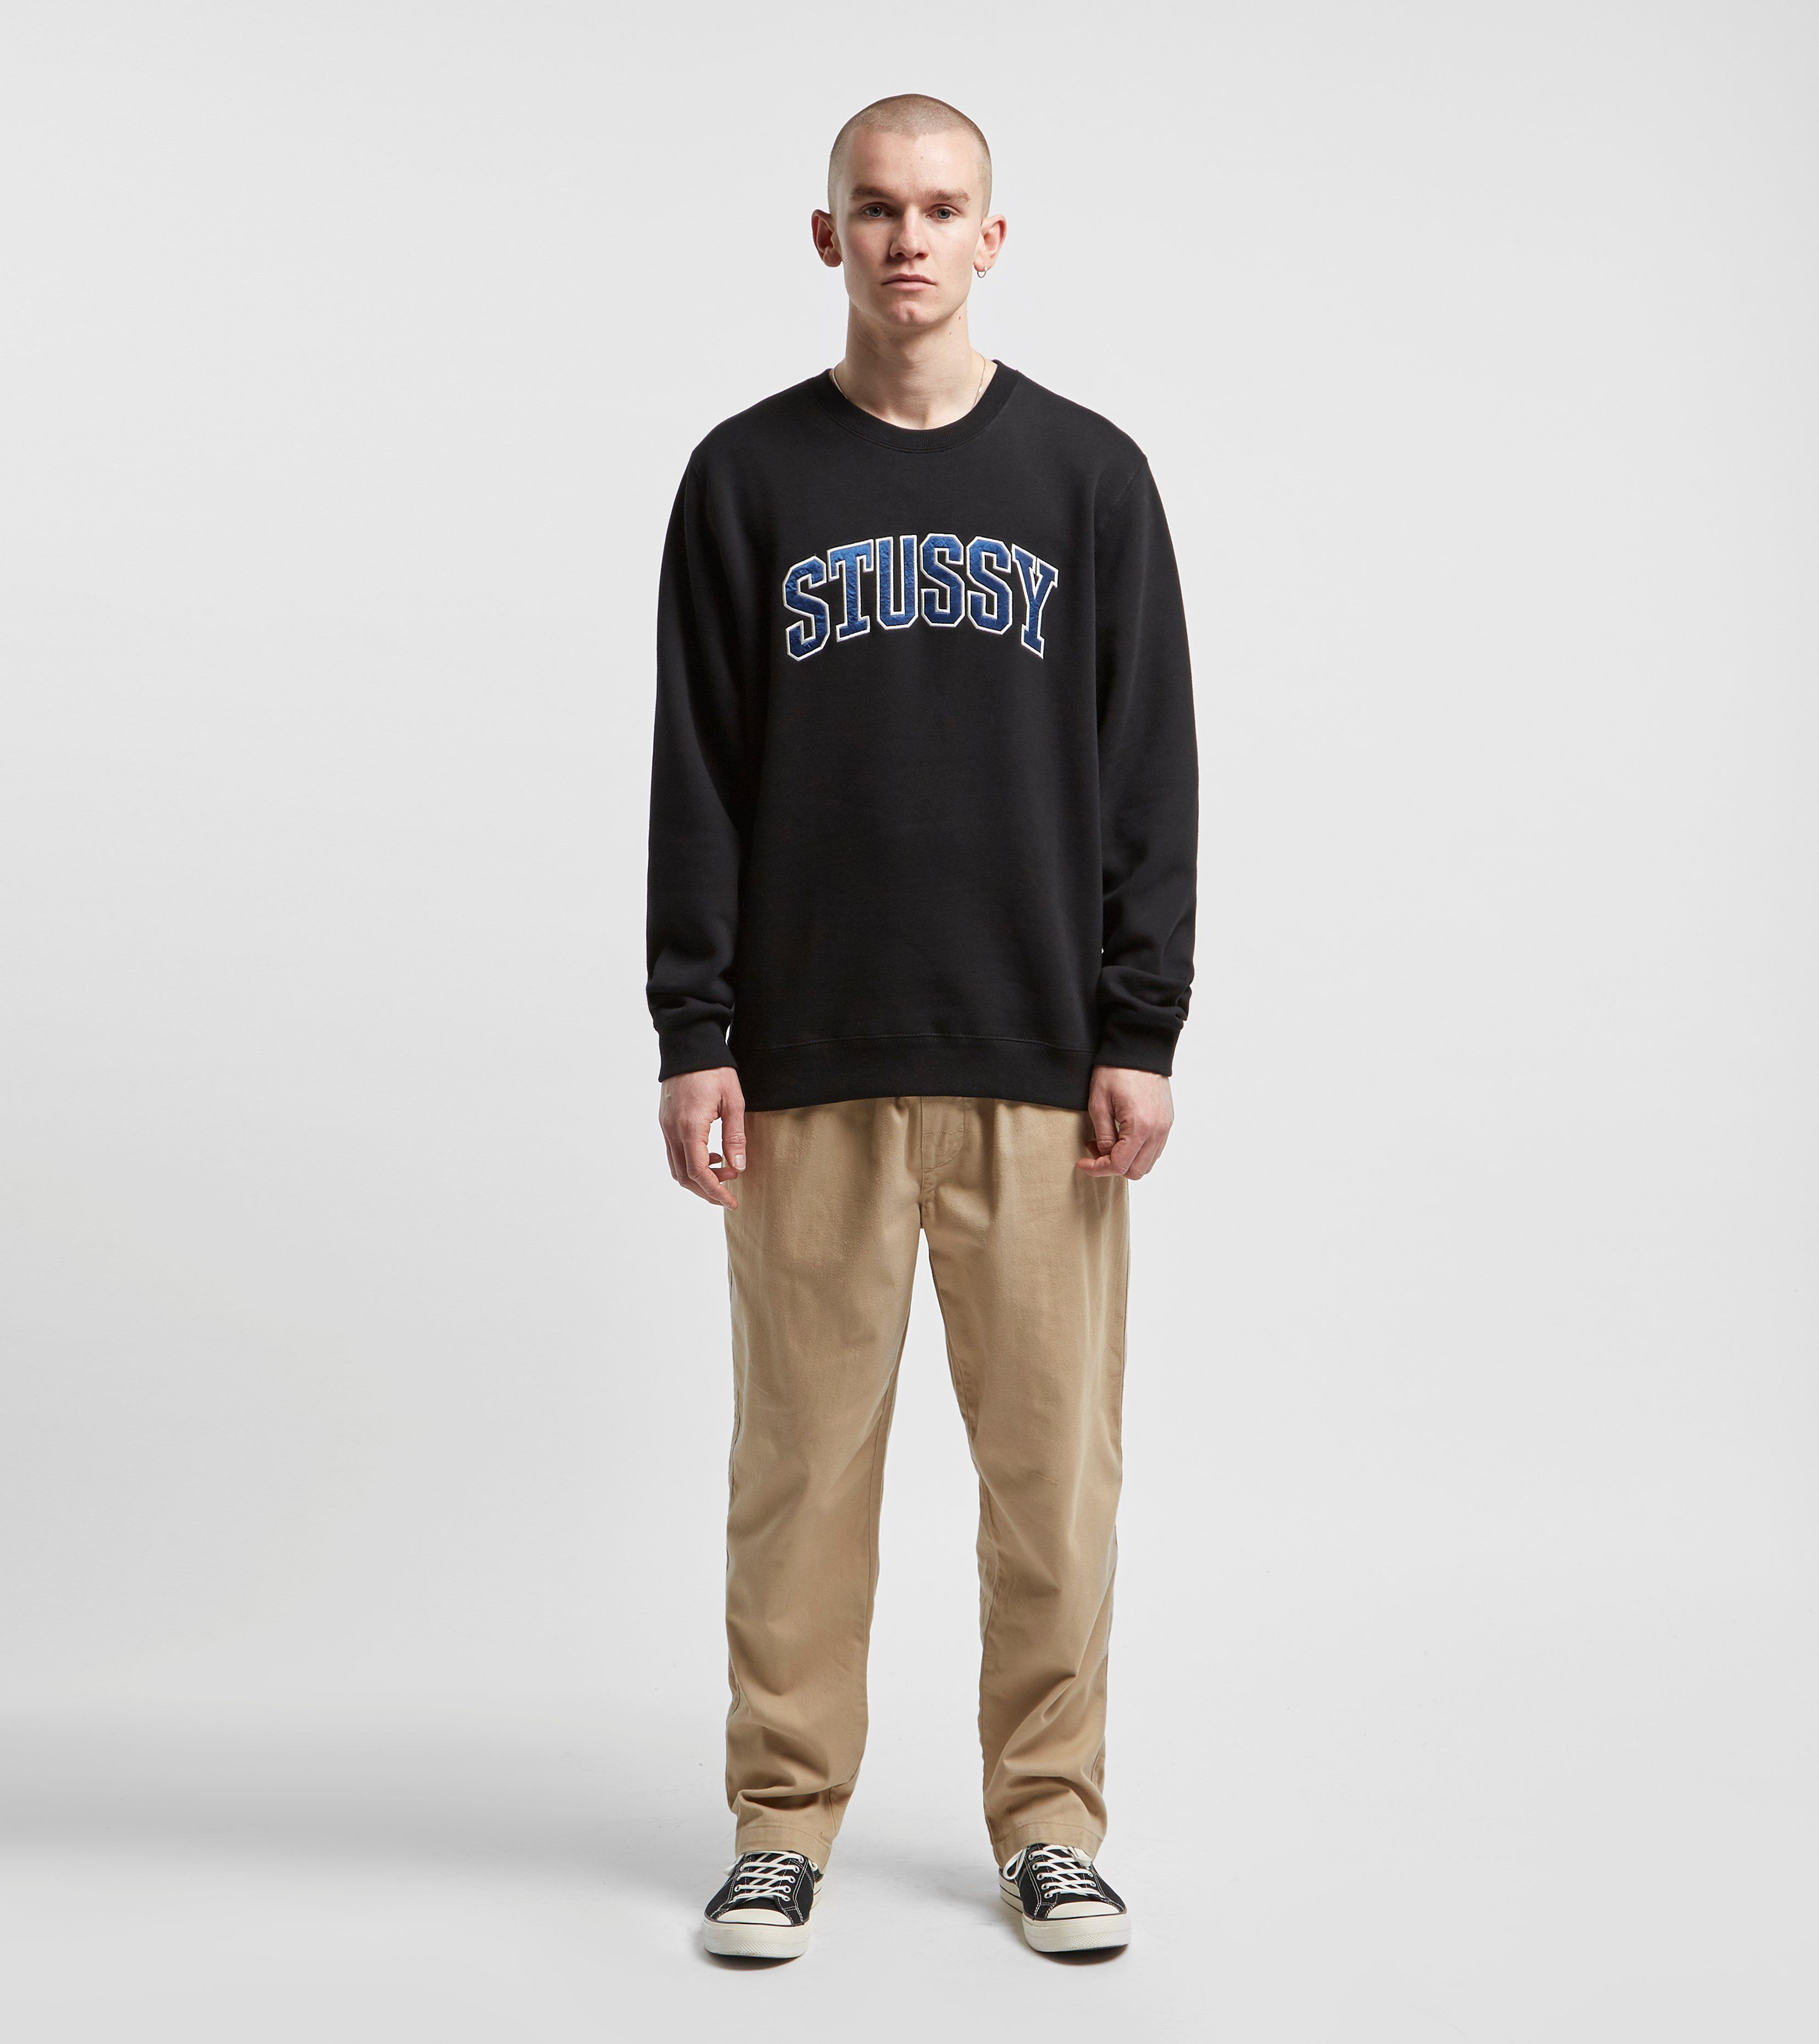 Stussy Arch Applique Crew Sweatshirt